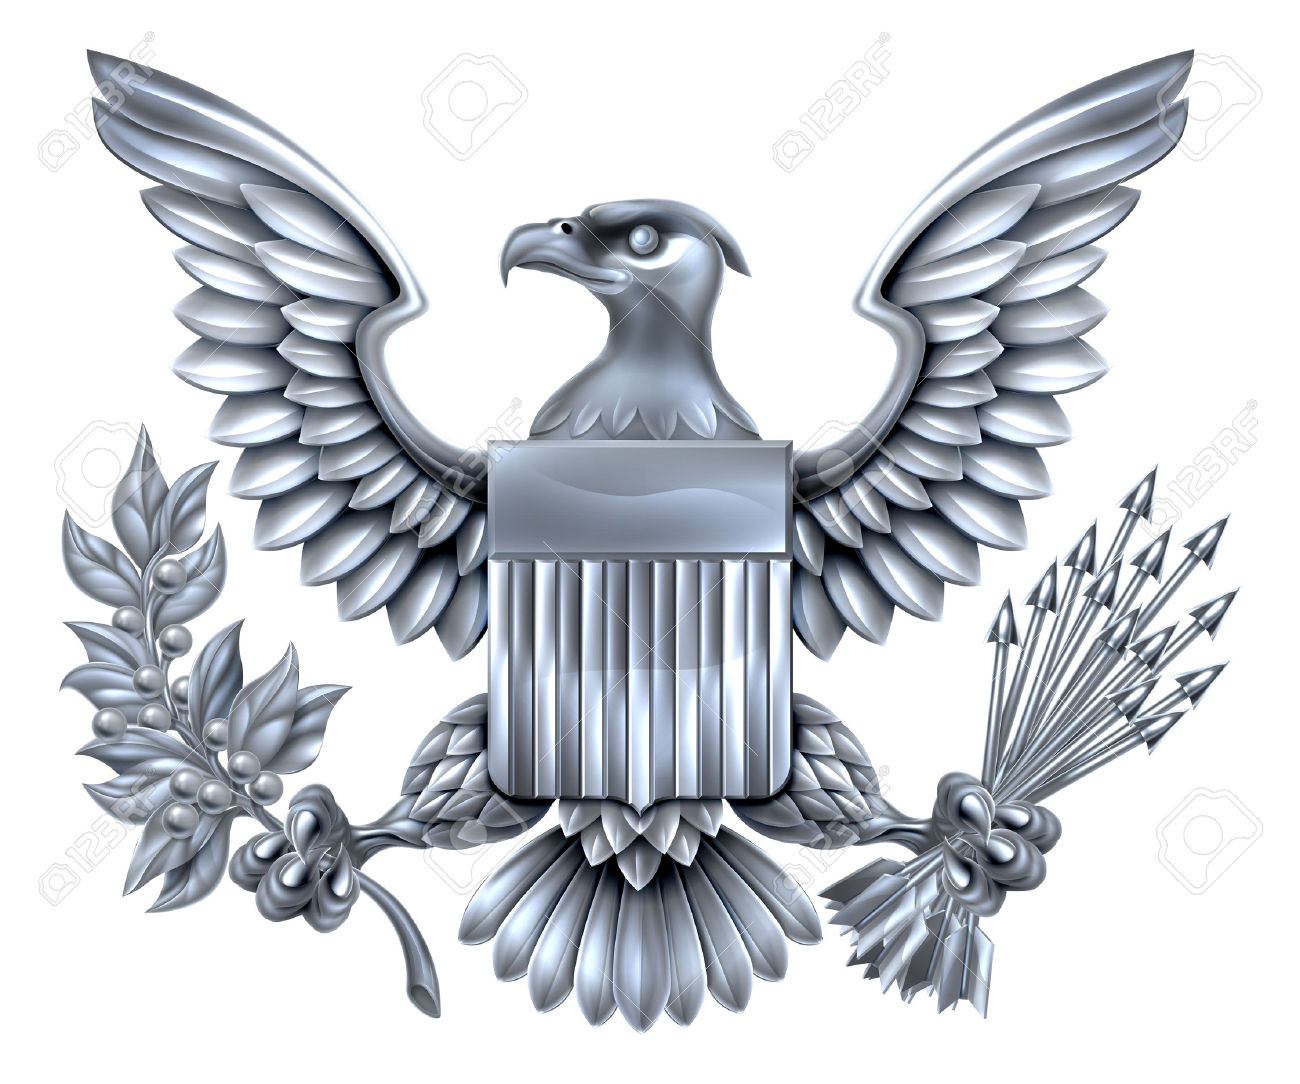 Silver Steel Metal American Eagle Design With Bald Eagle Like.